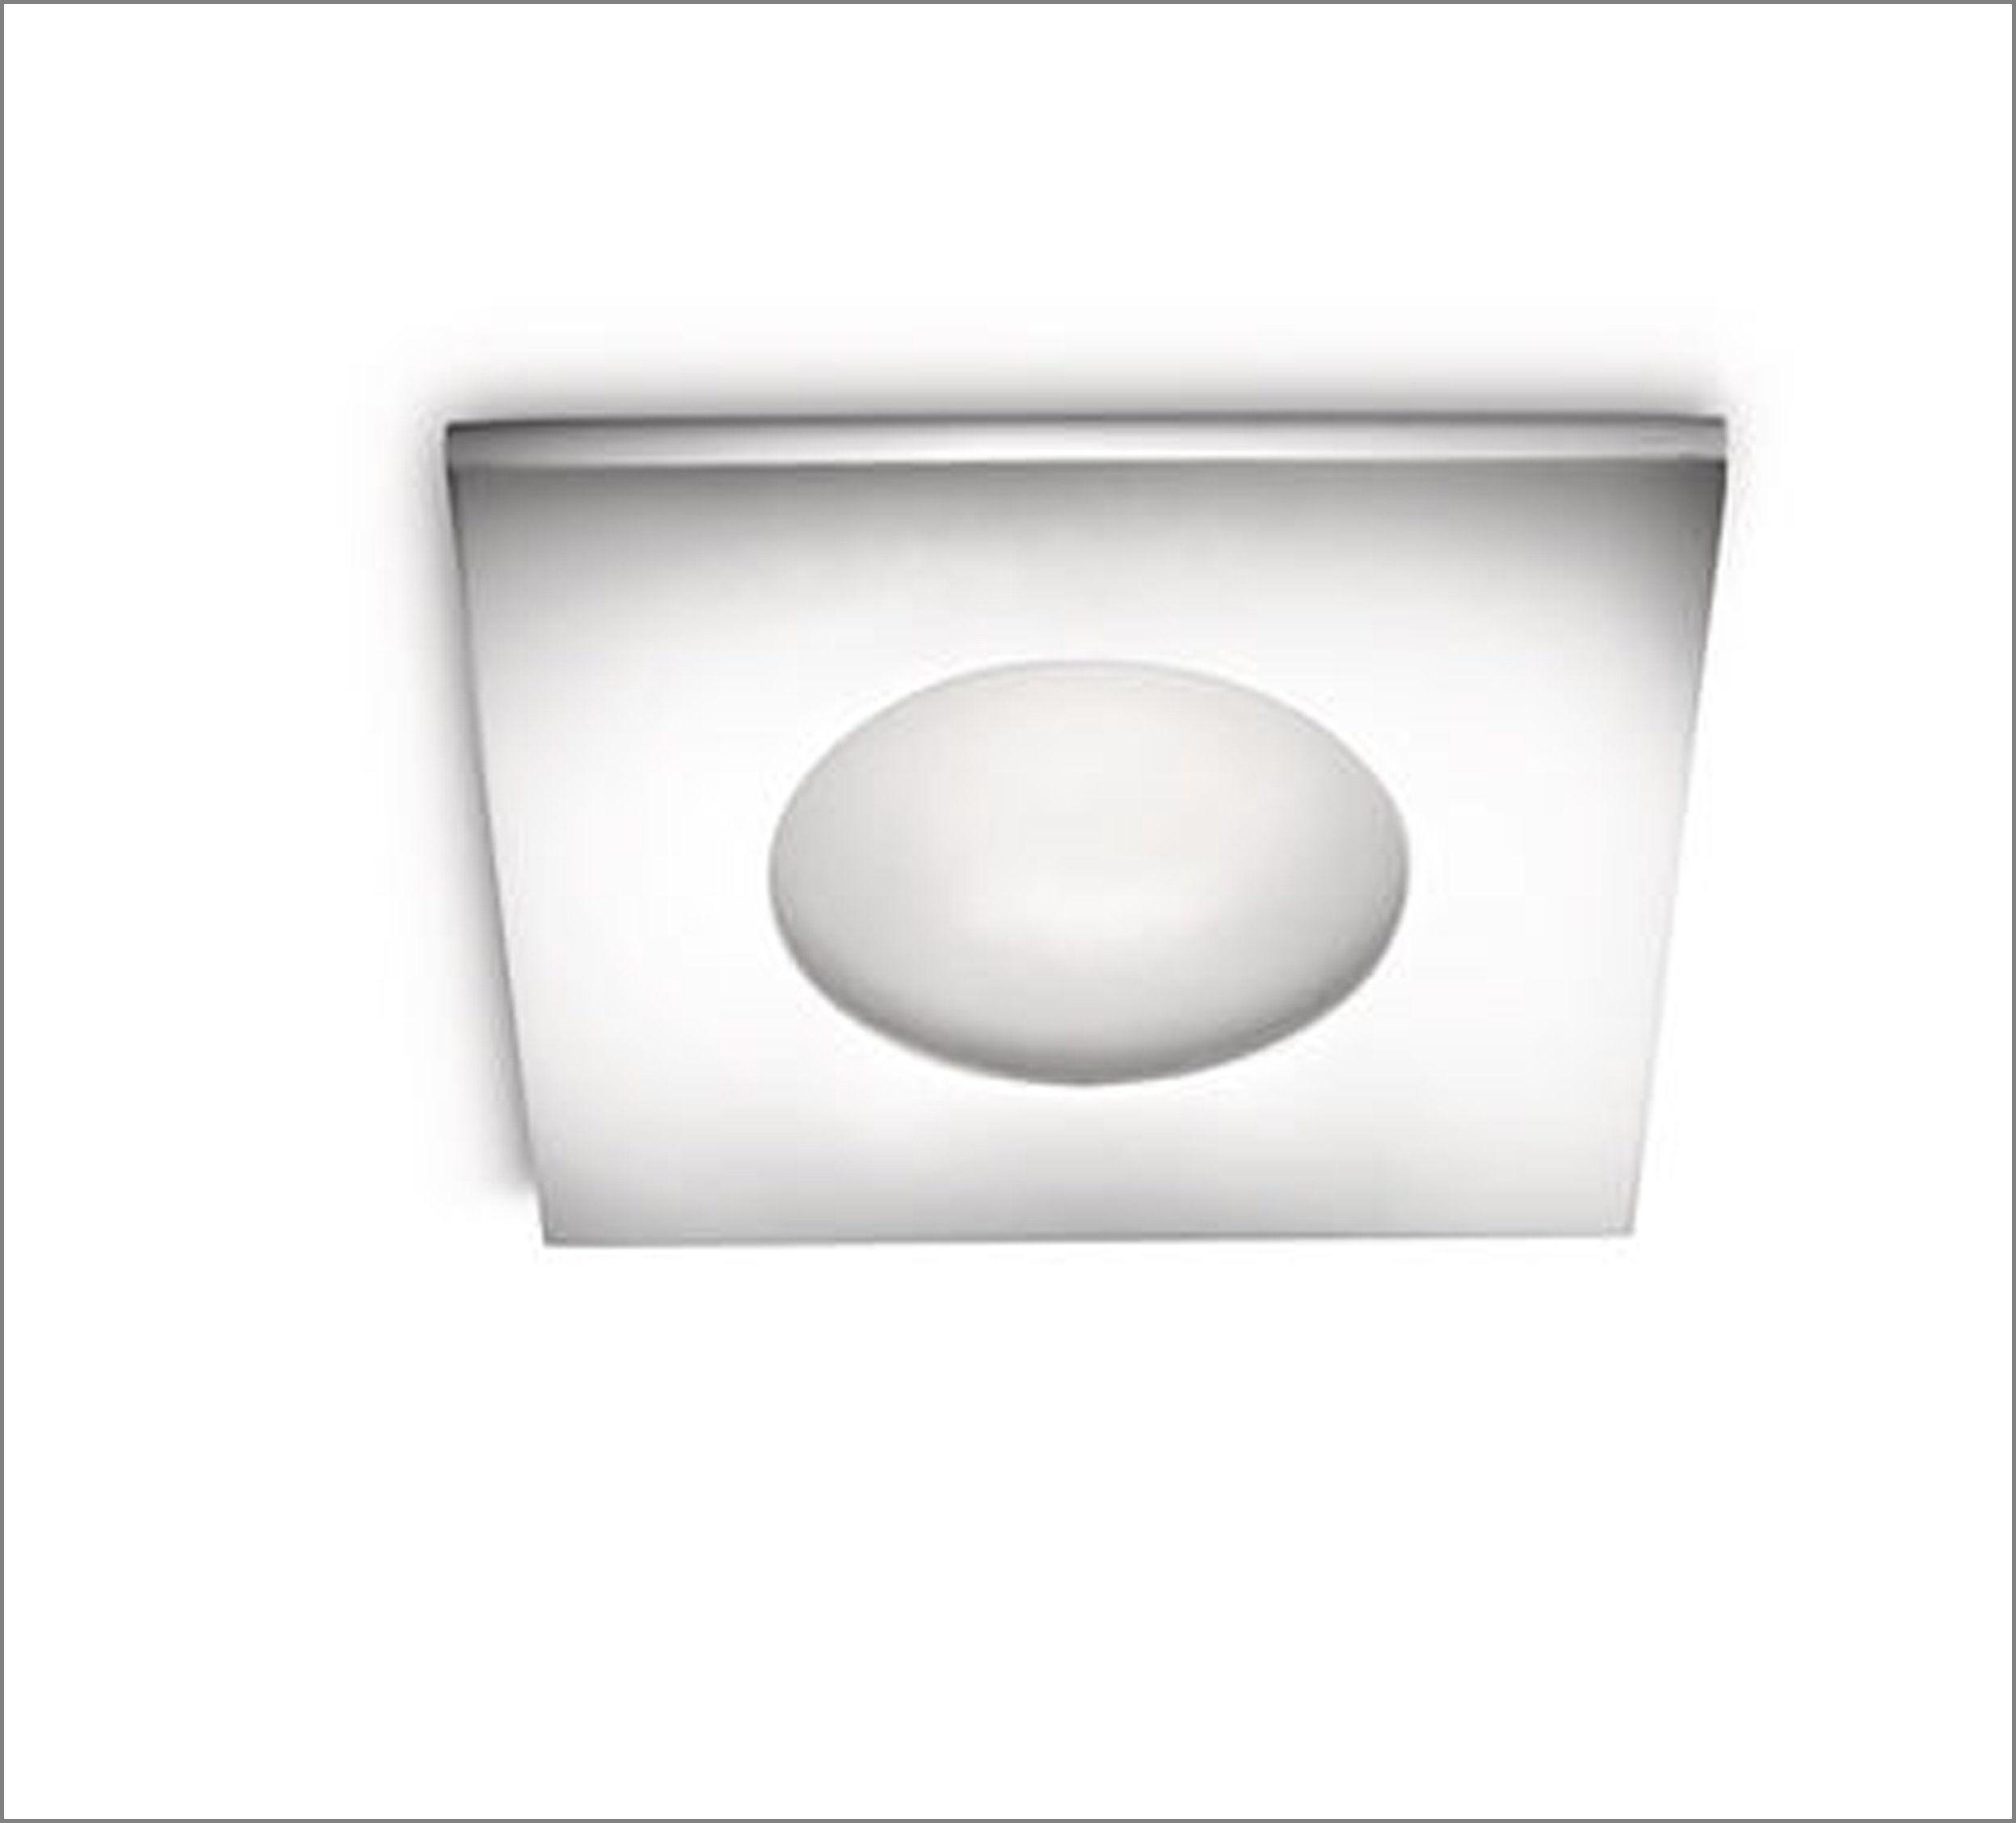 Oprawa punktowa THERMAL 1xGU10 59910/11/16 Philips chrom